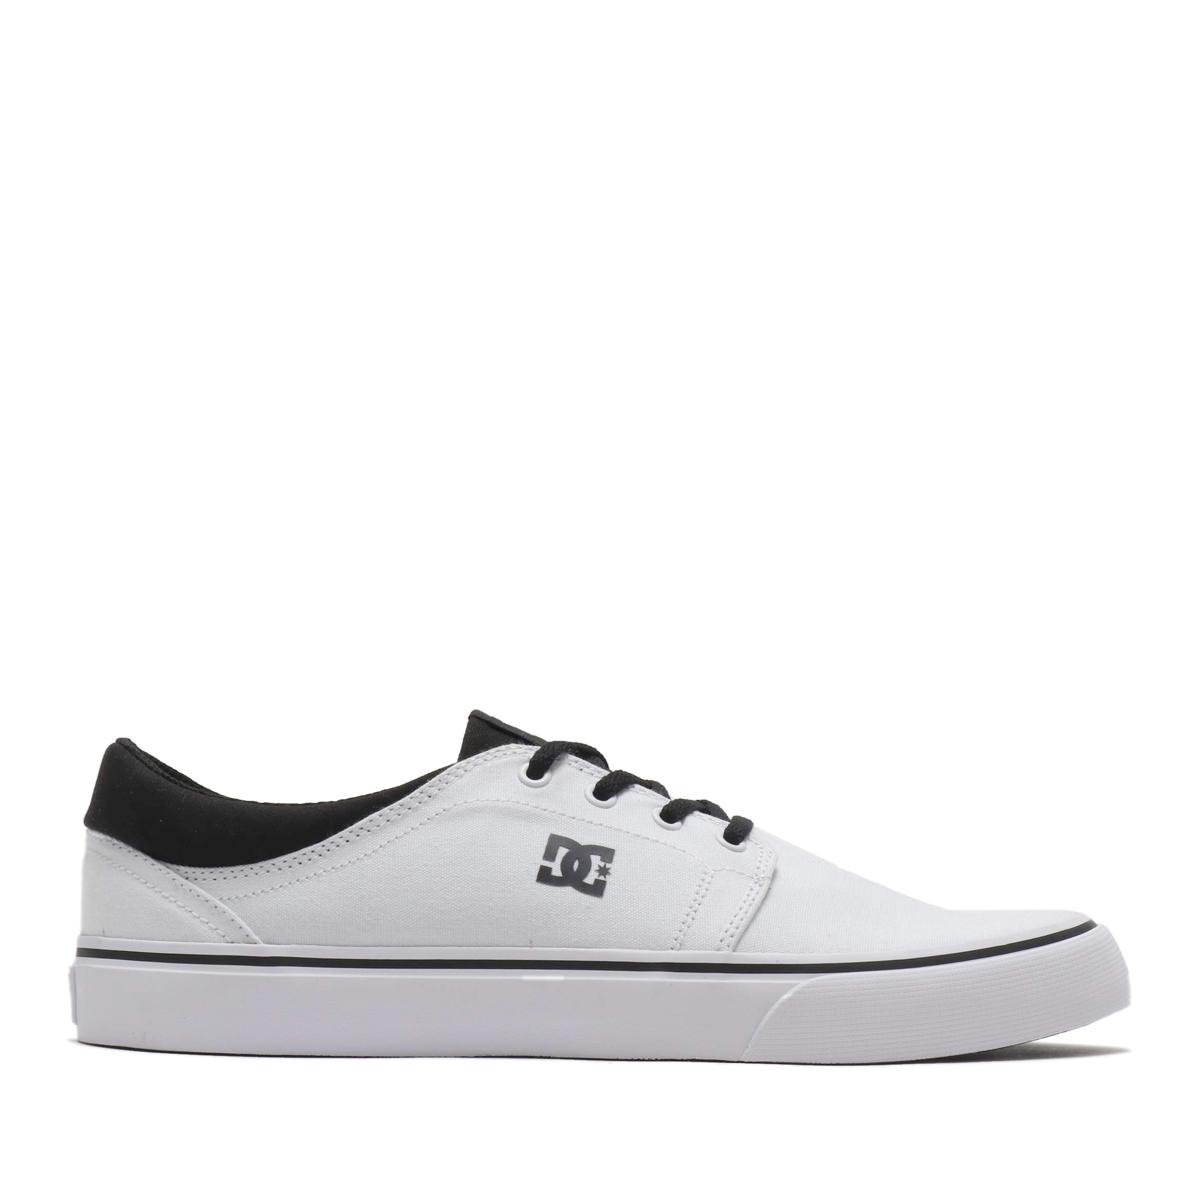 b9c36ab8937d ... kinetics dc shoes trase tx white black white d sea shoes trace ...